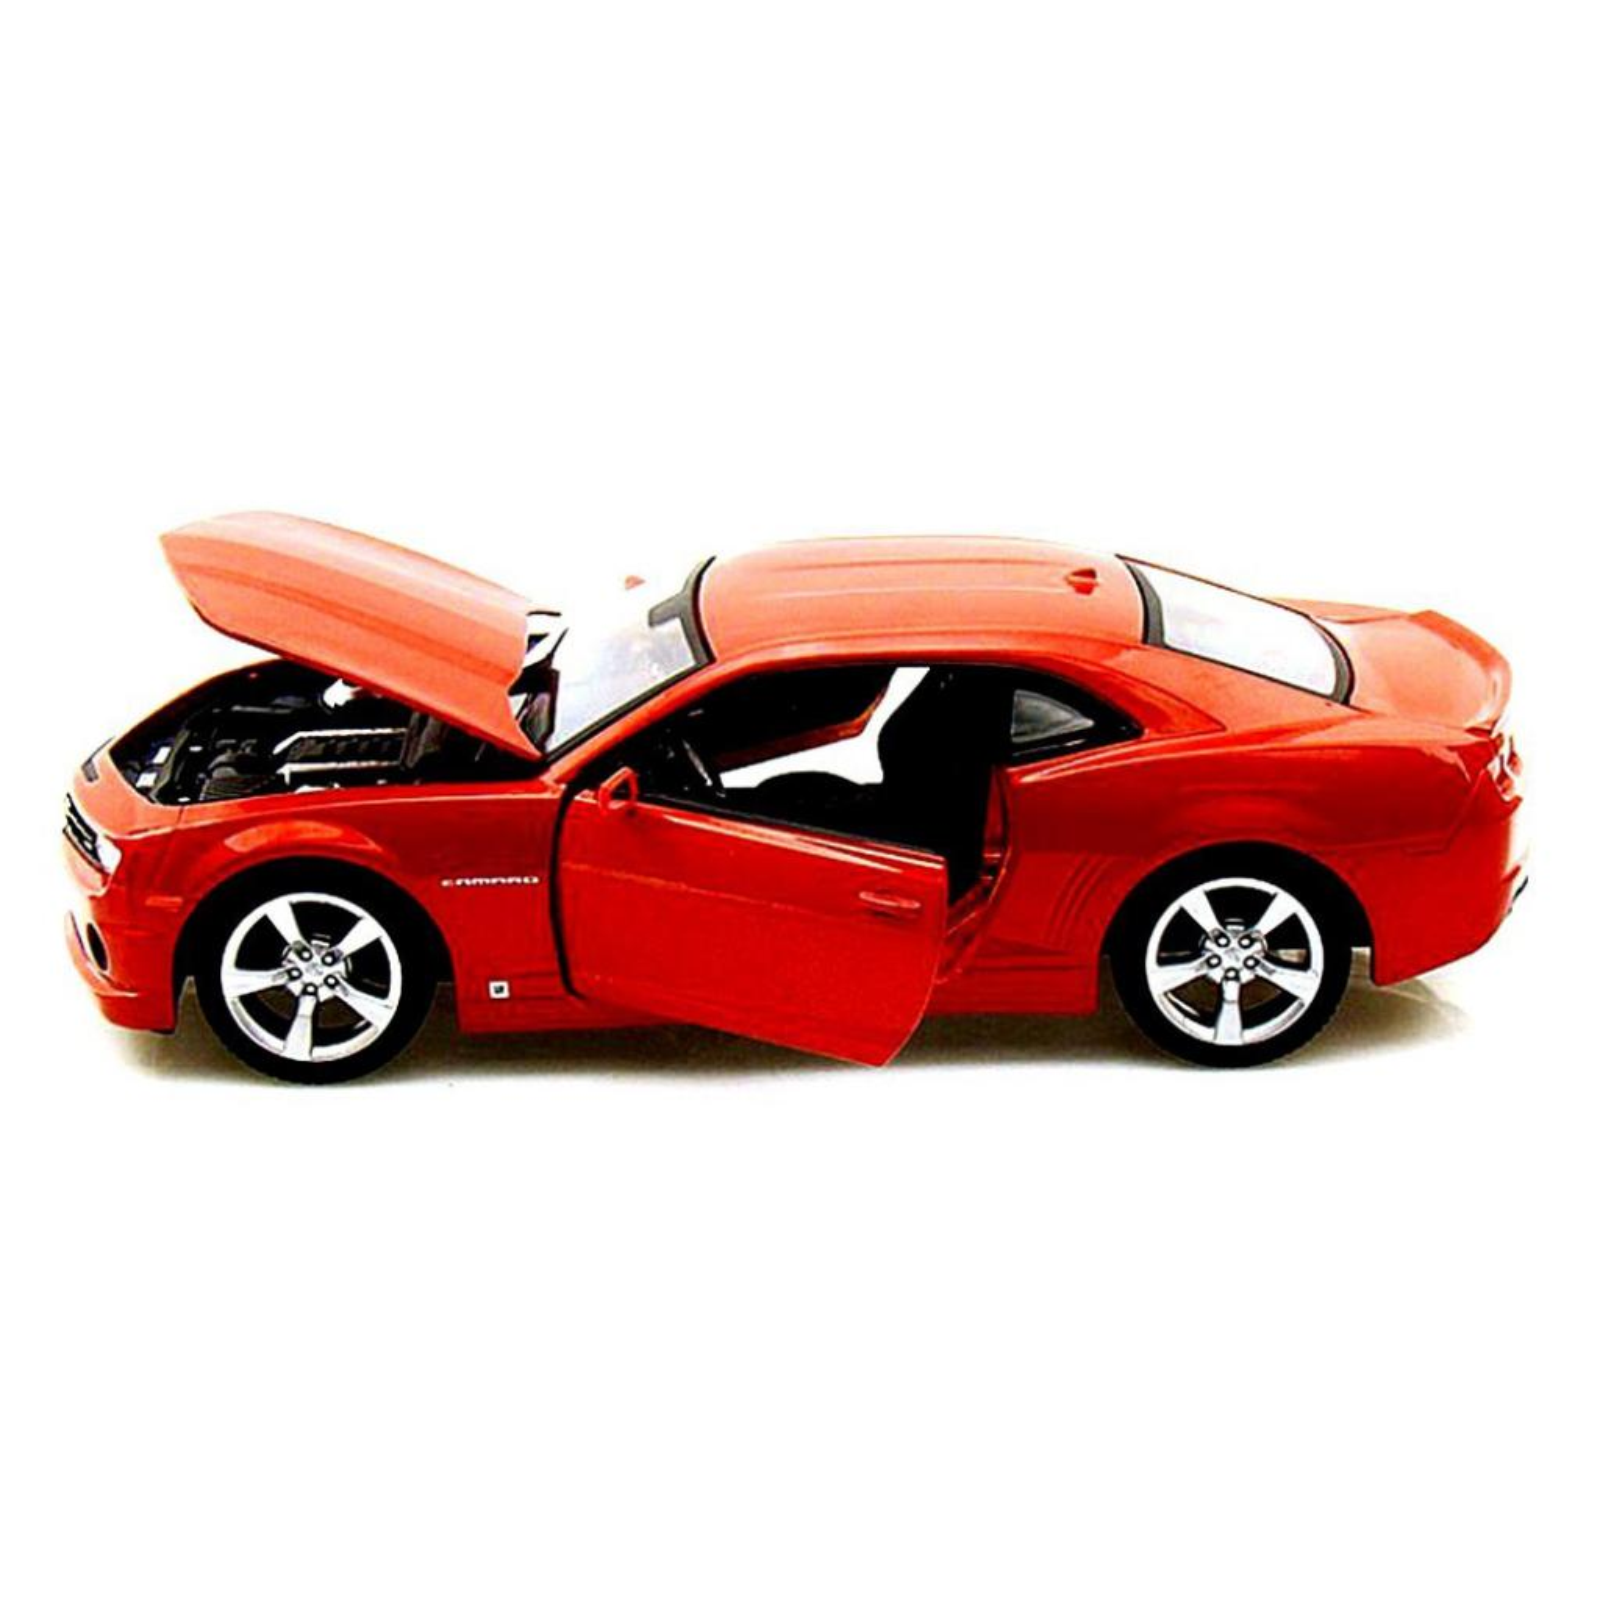 Машина Maisto Chevrolet Camaro SS RS 2010 (1:24) оранжевый металлик (31207 met. orange) изображение 3